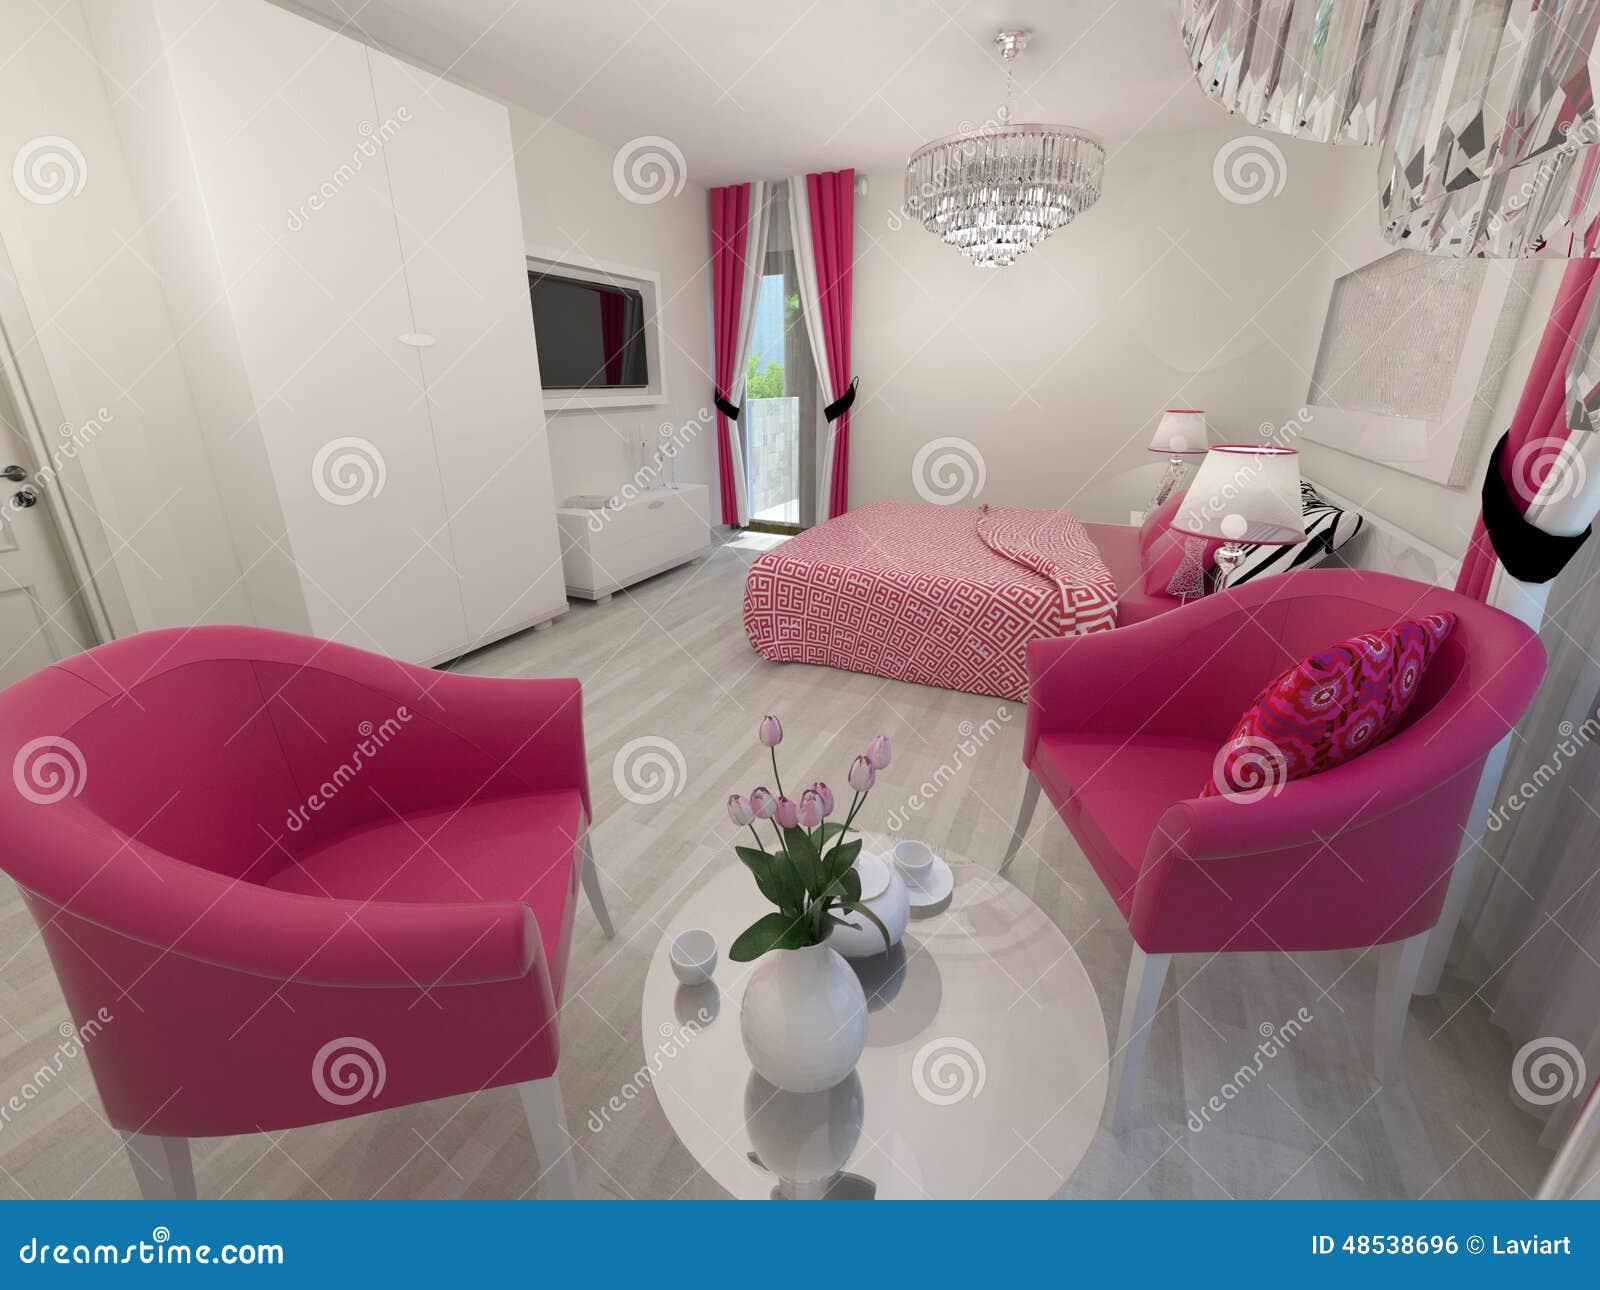 Chambre à Coucher Blanche Et Rose Moderne Illustration Stock ...